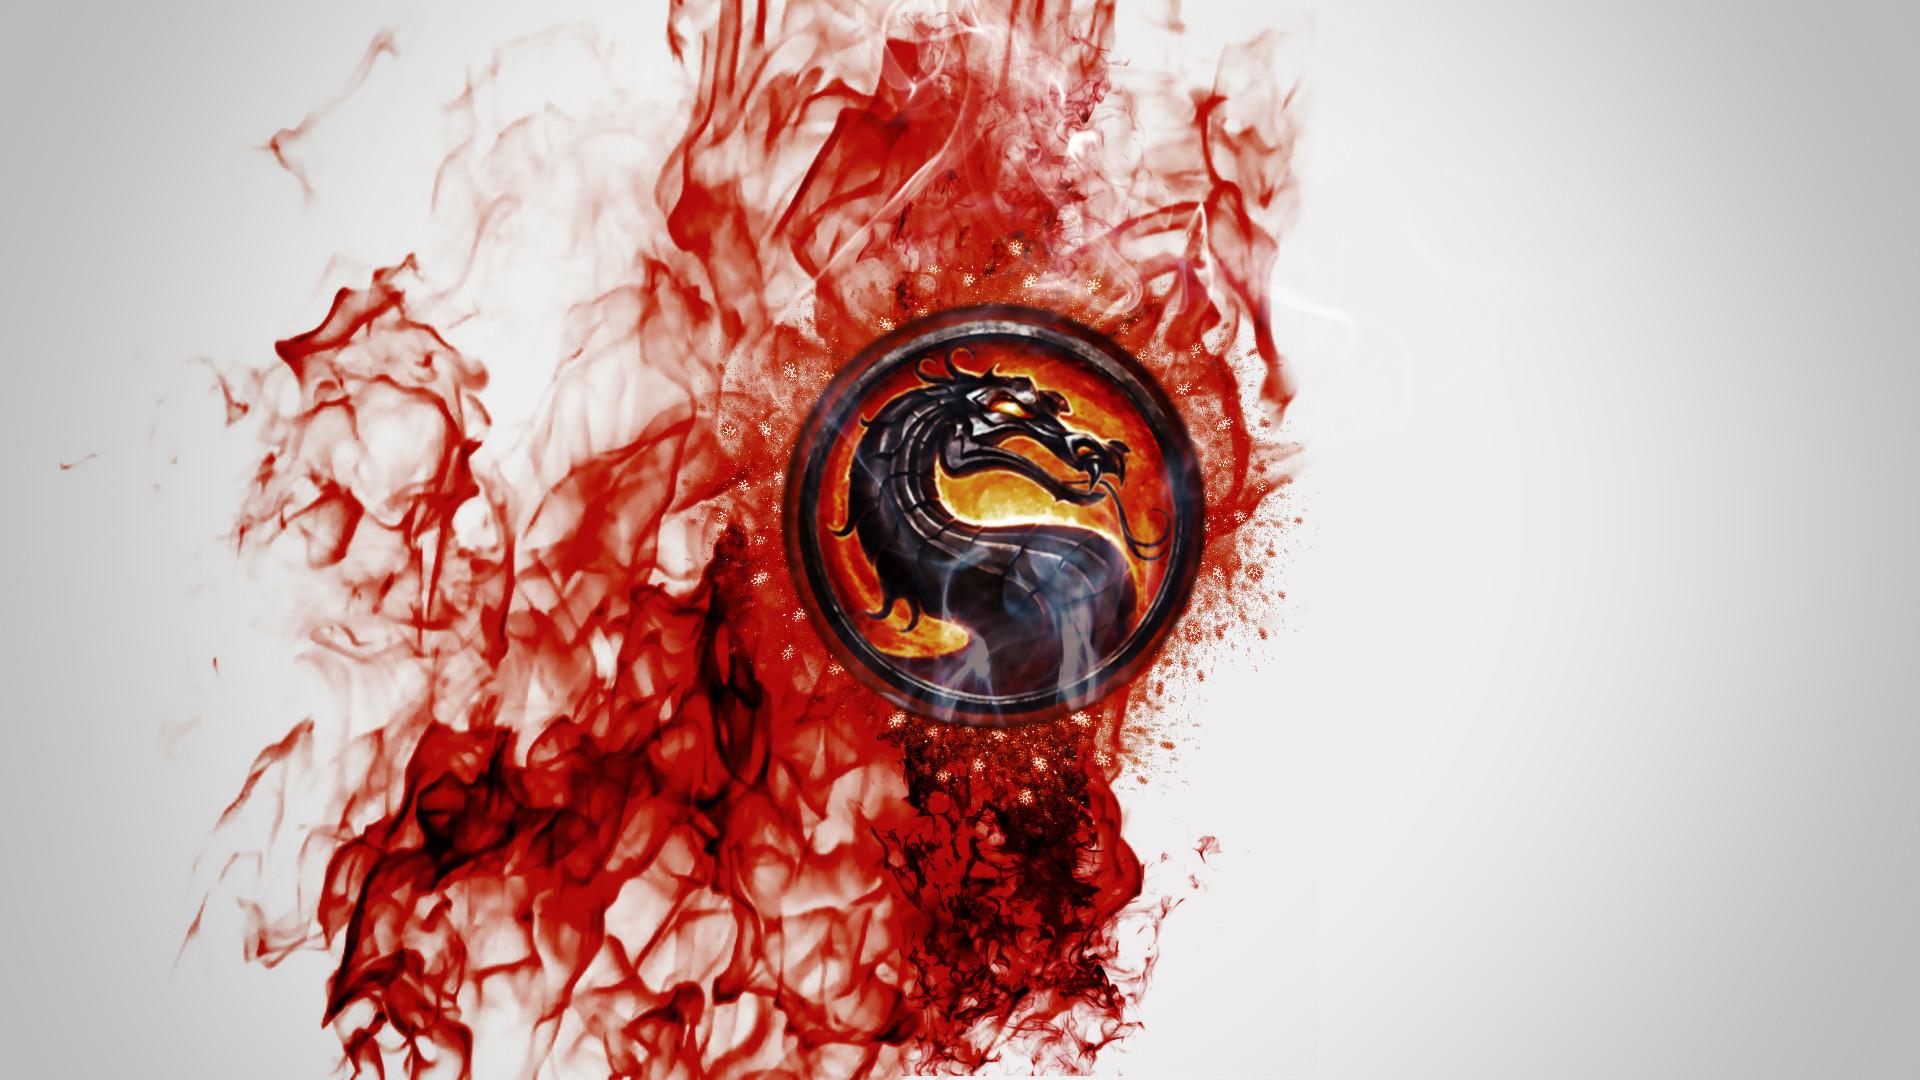 Mortal Kombat wallpaper Dragon in blood Read more